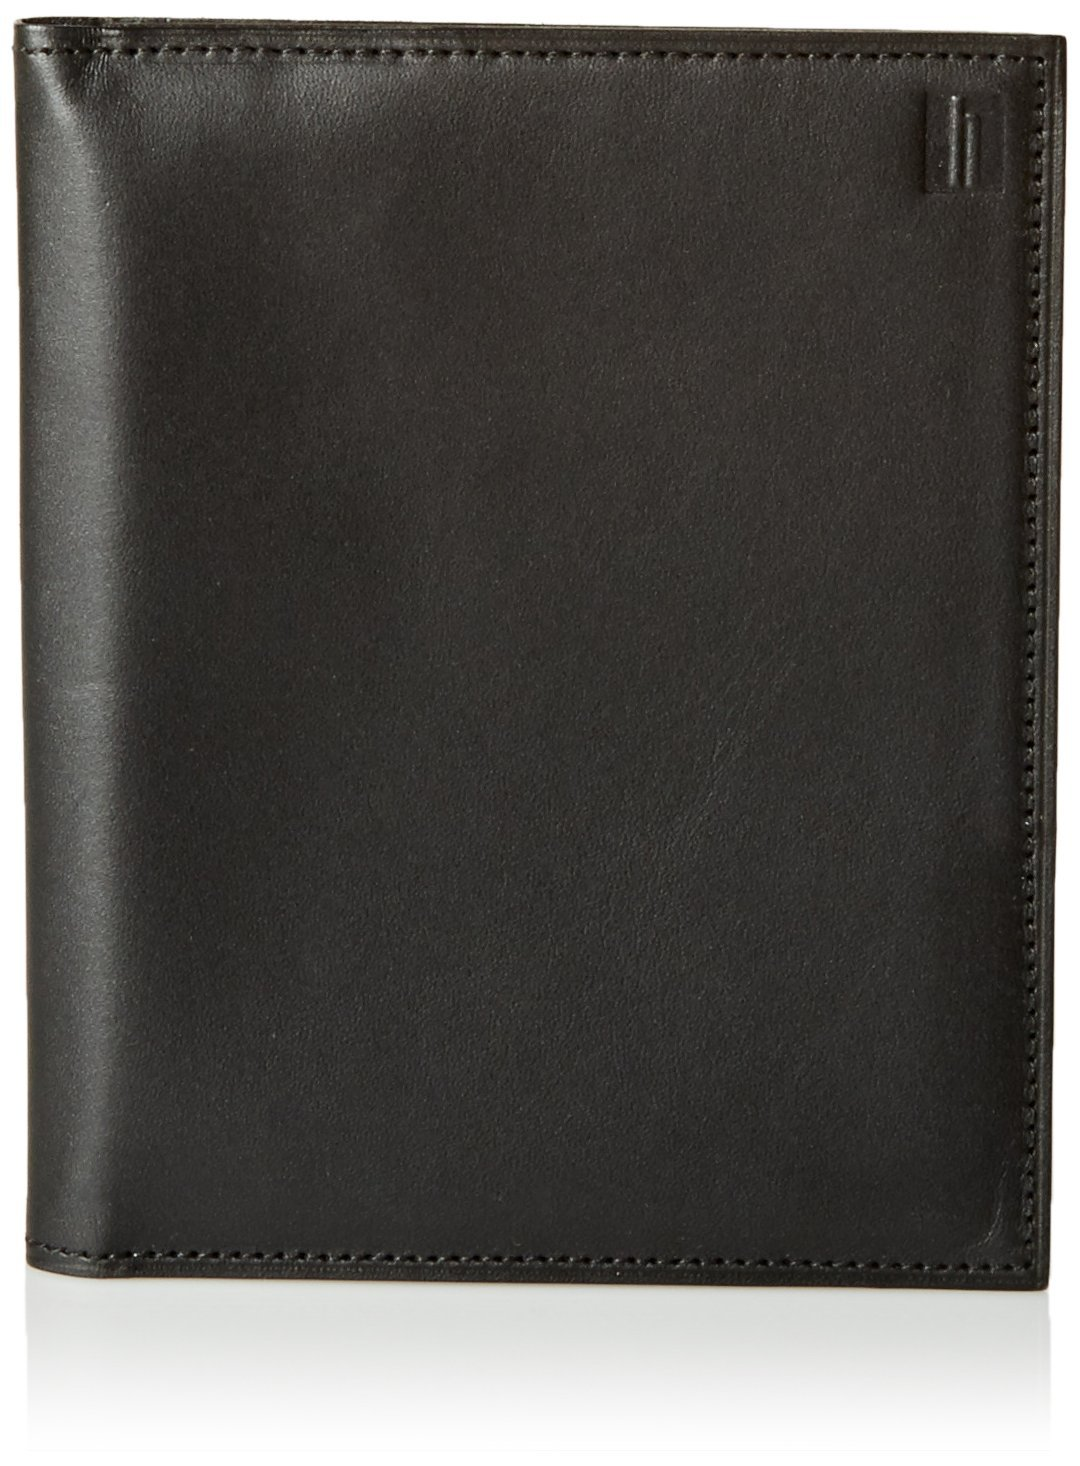 Hartmann American Reserve Passport Jacket, Heritage Black, One Size by Hartmann